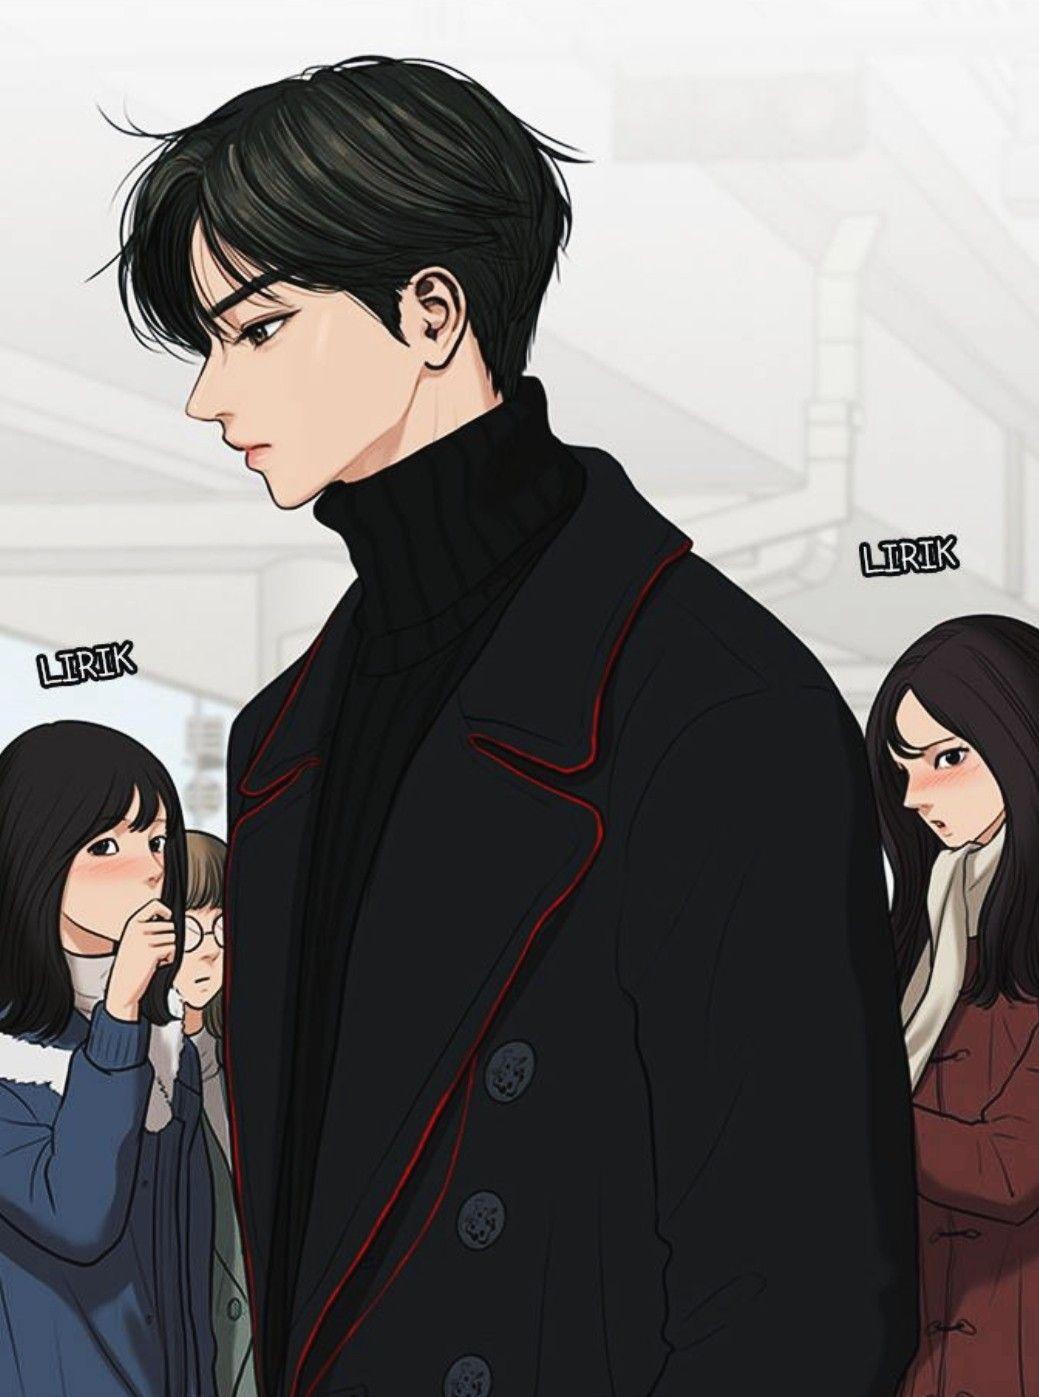 The Secret Of Angel Suho Lee Webtoon Gambar Fotografi Potret Komik Romantis